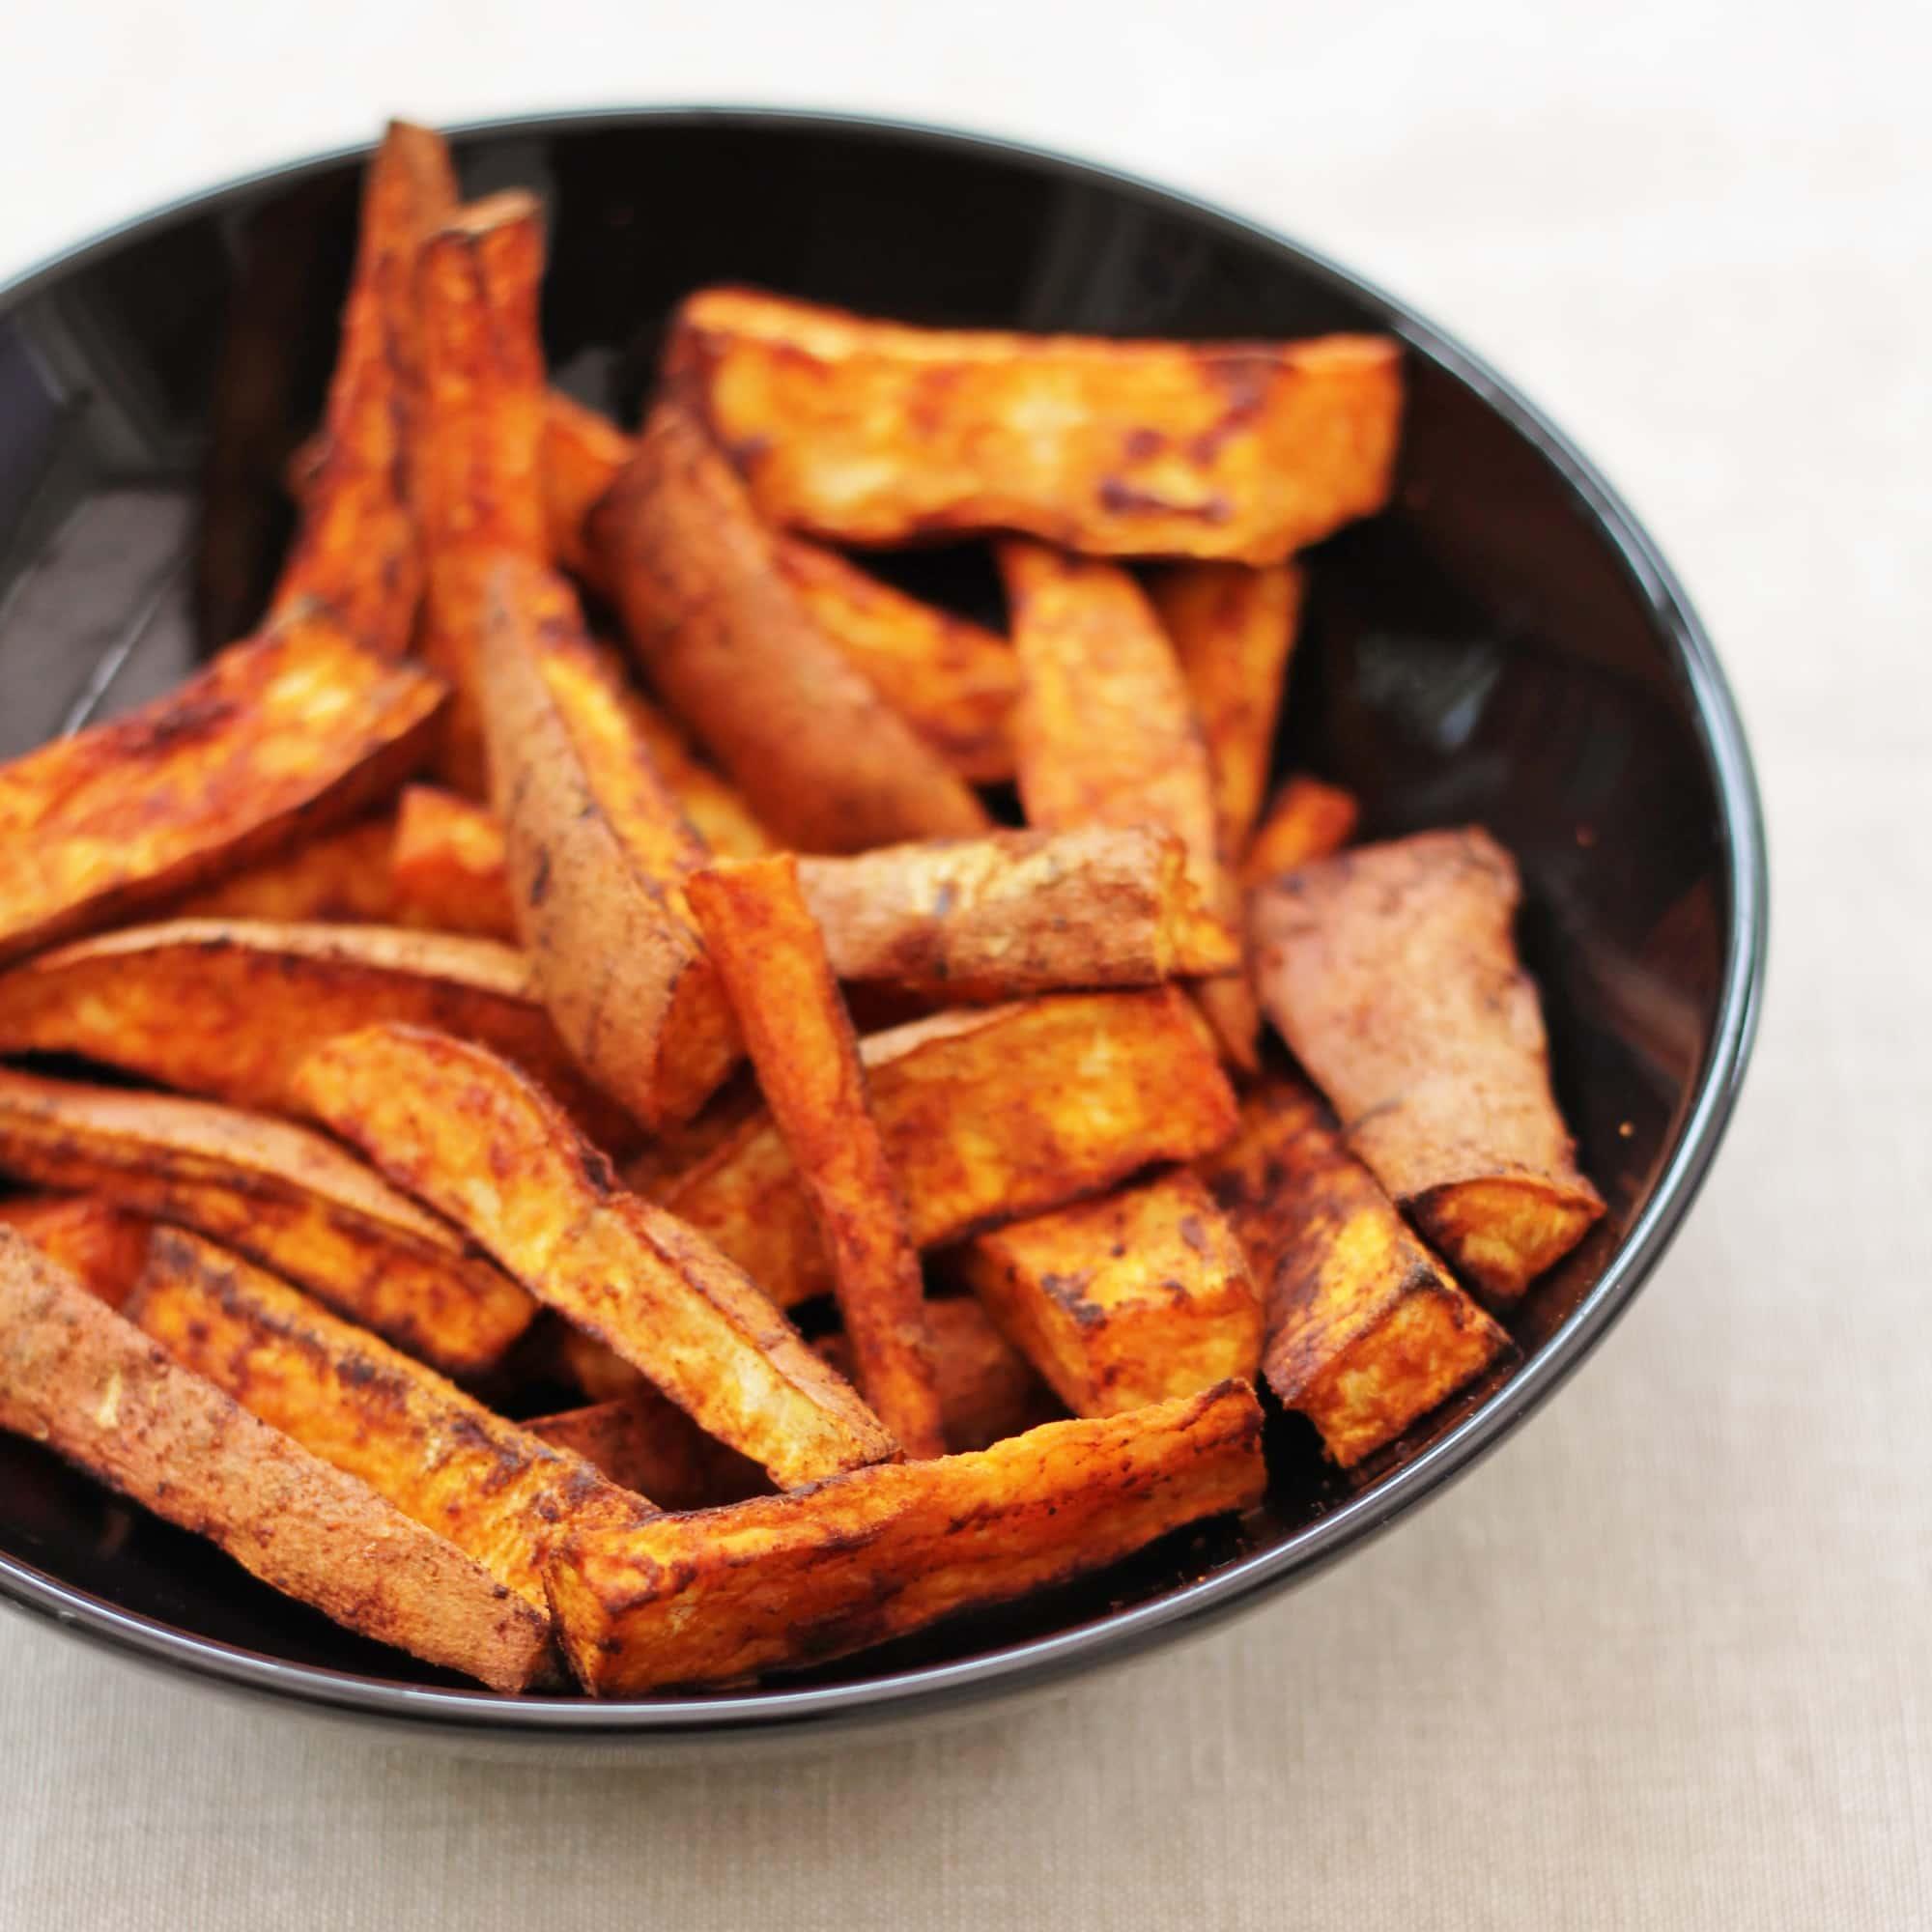 Homemade Sweet Potato and Smoked Paprika Chips